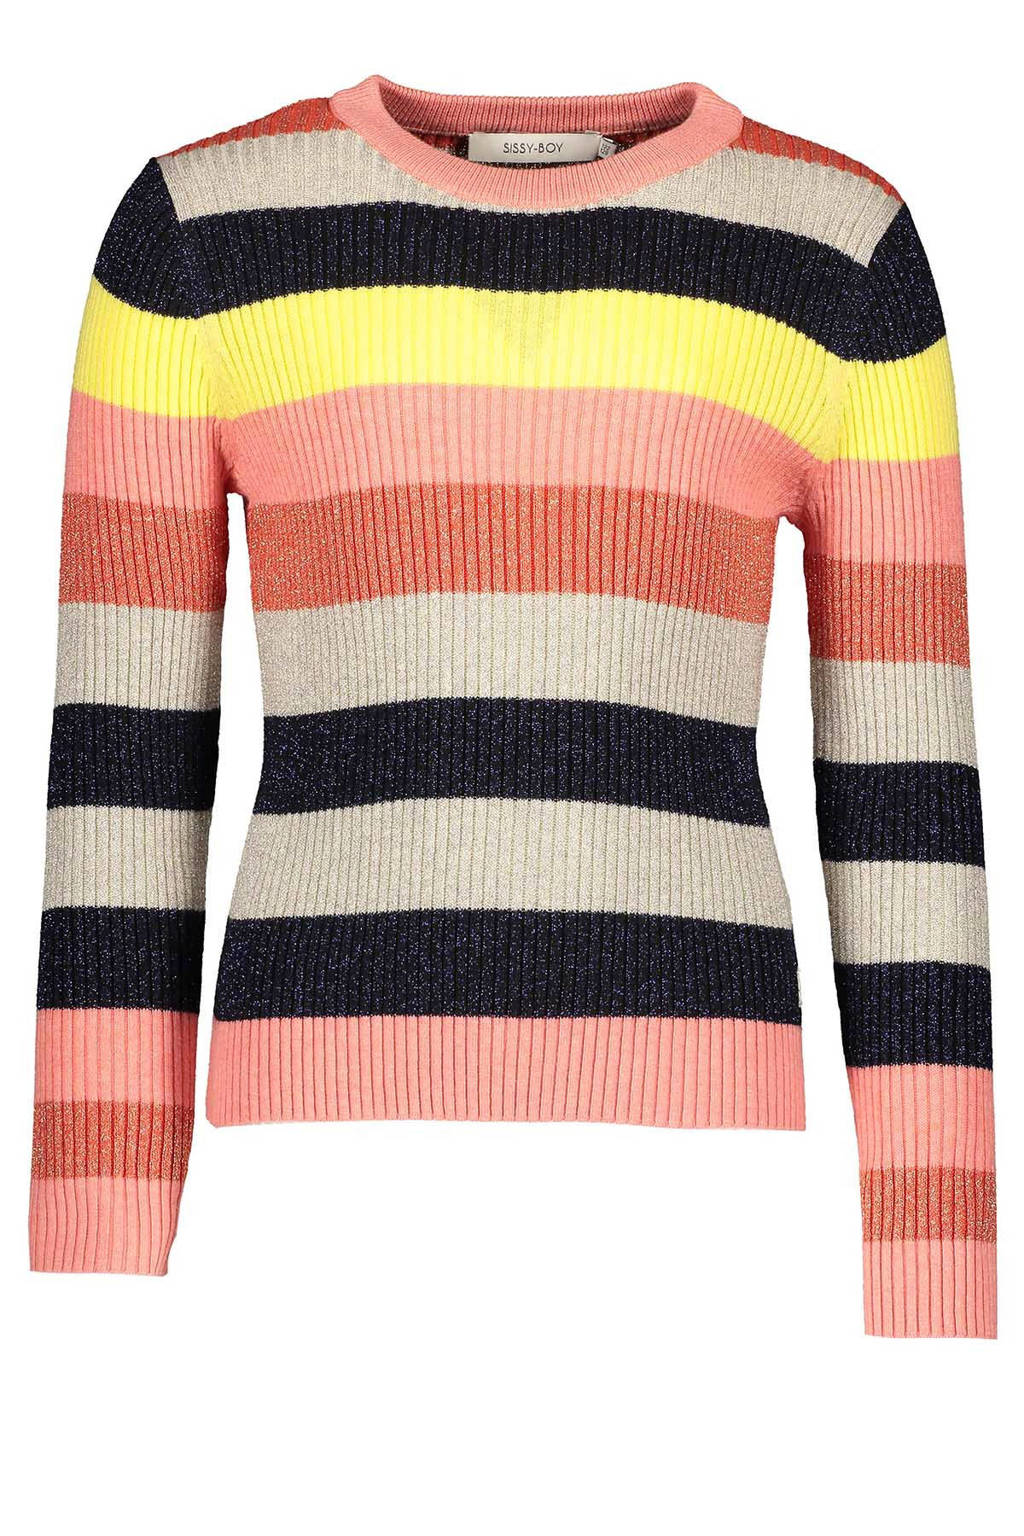 Sissy-Boy trui met strepen, Roze/zwart/geel